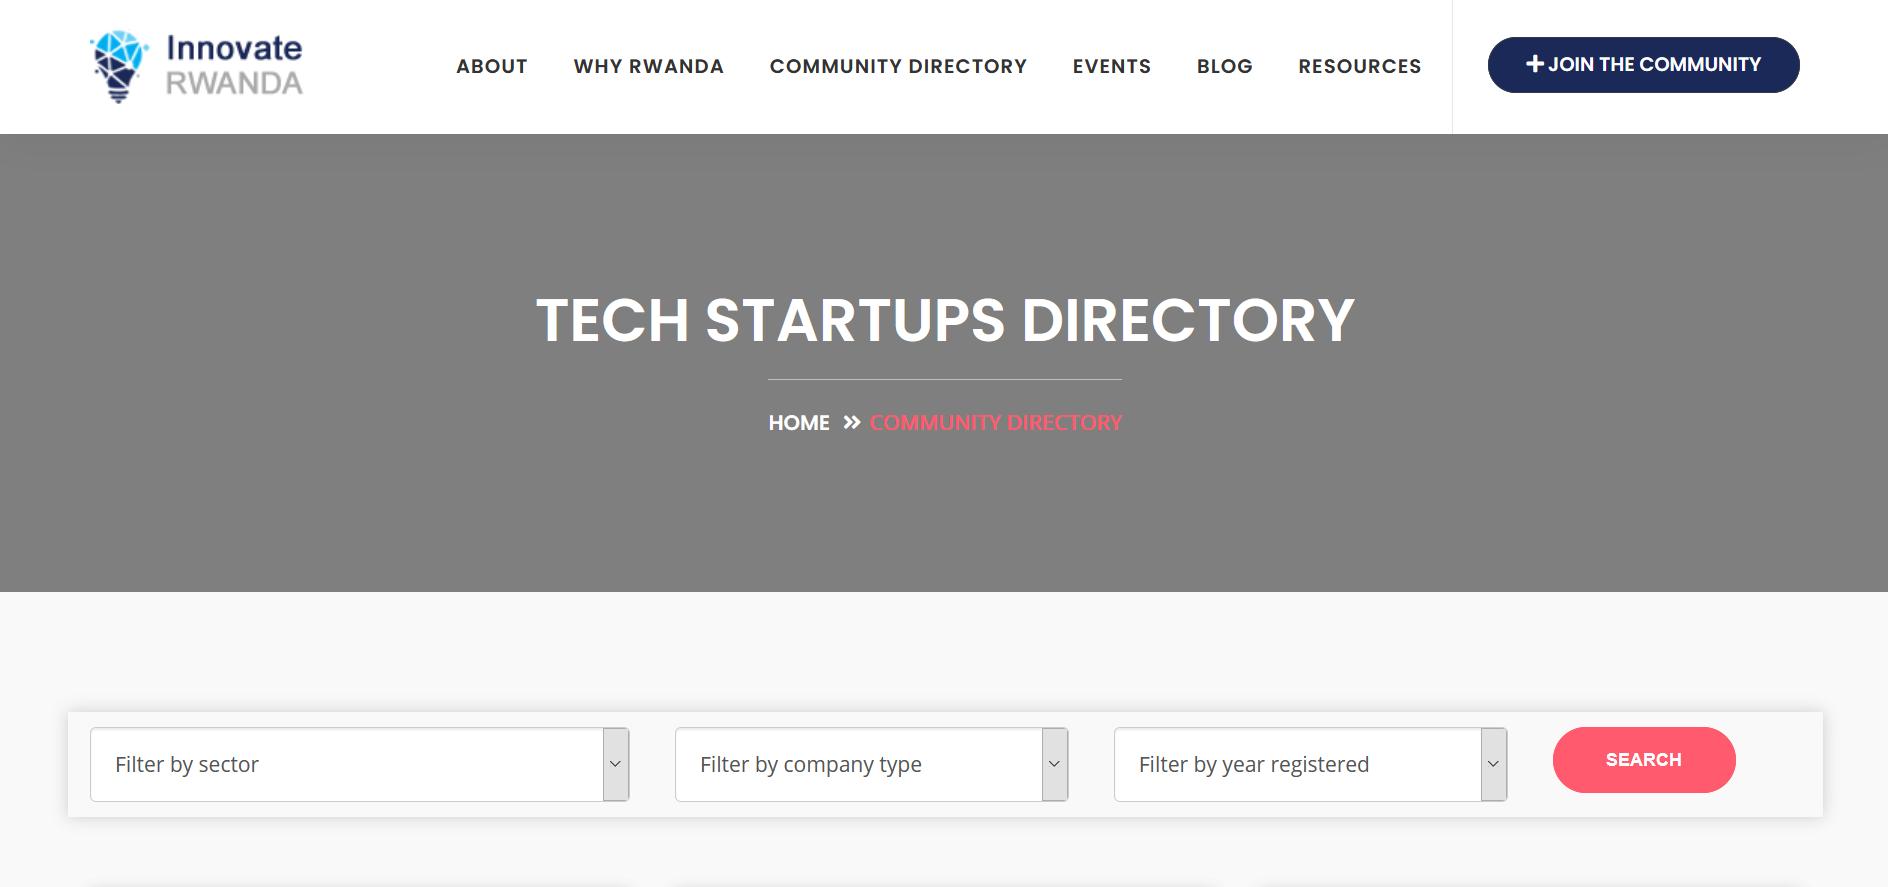 Tech-startups-directory-Innovate-Rwanda.